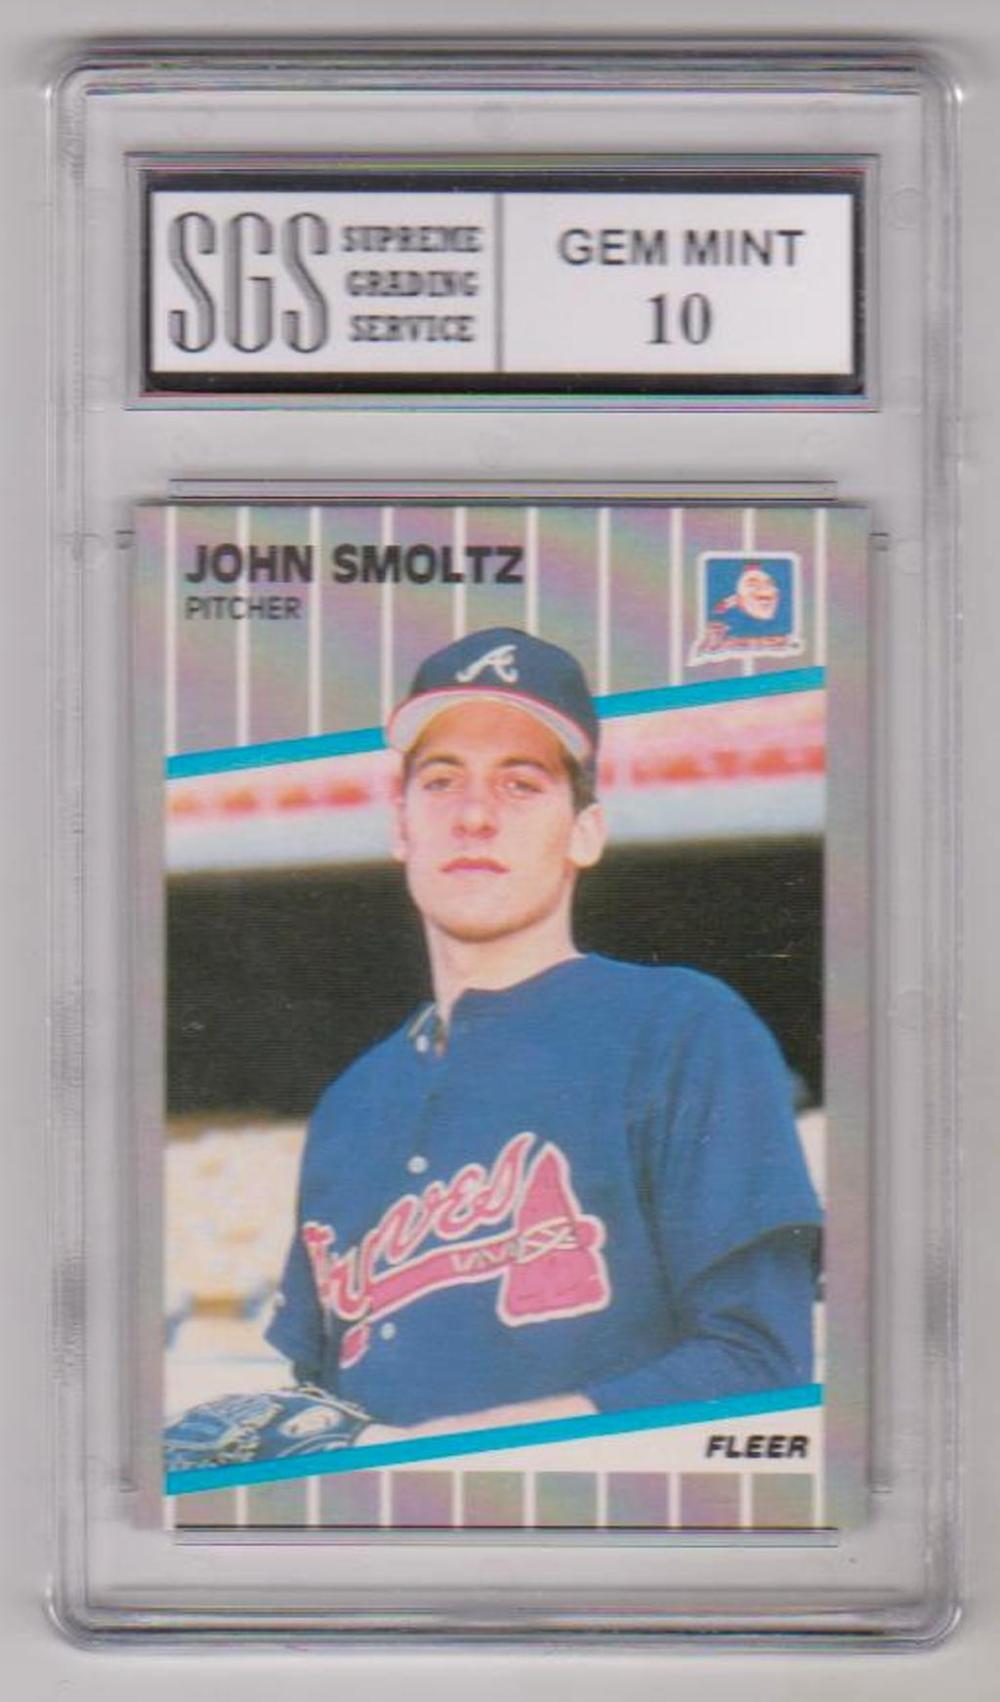 Graded Gem Mint 10 John Smoltz 1989 Fleer 602 Rookie Card